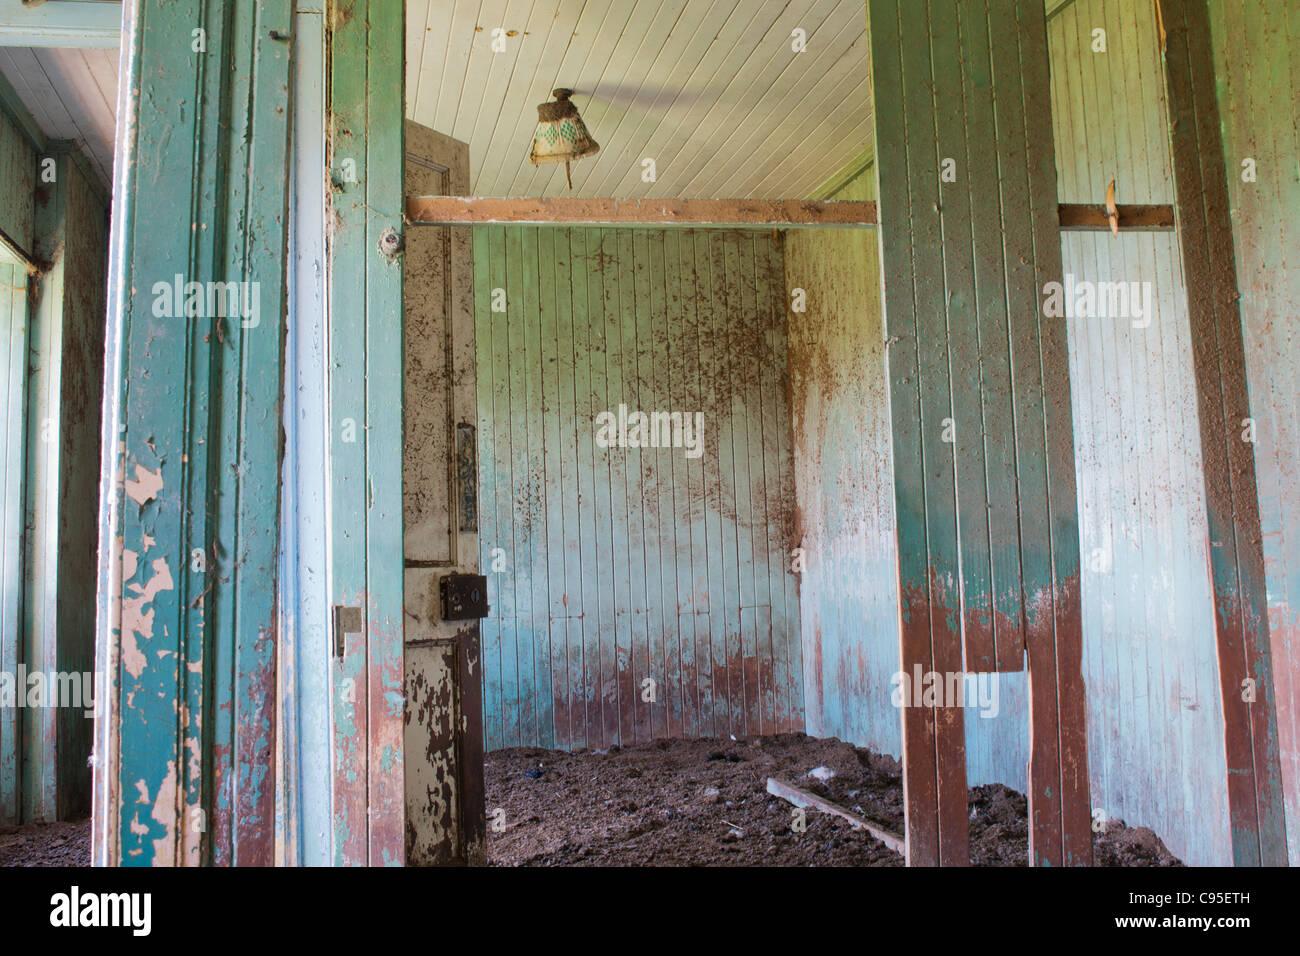 Building, Croft House, Abandoned, Interior, - Stock Image